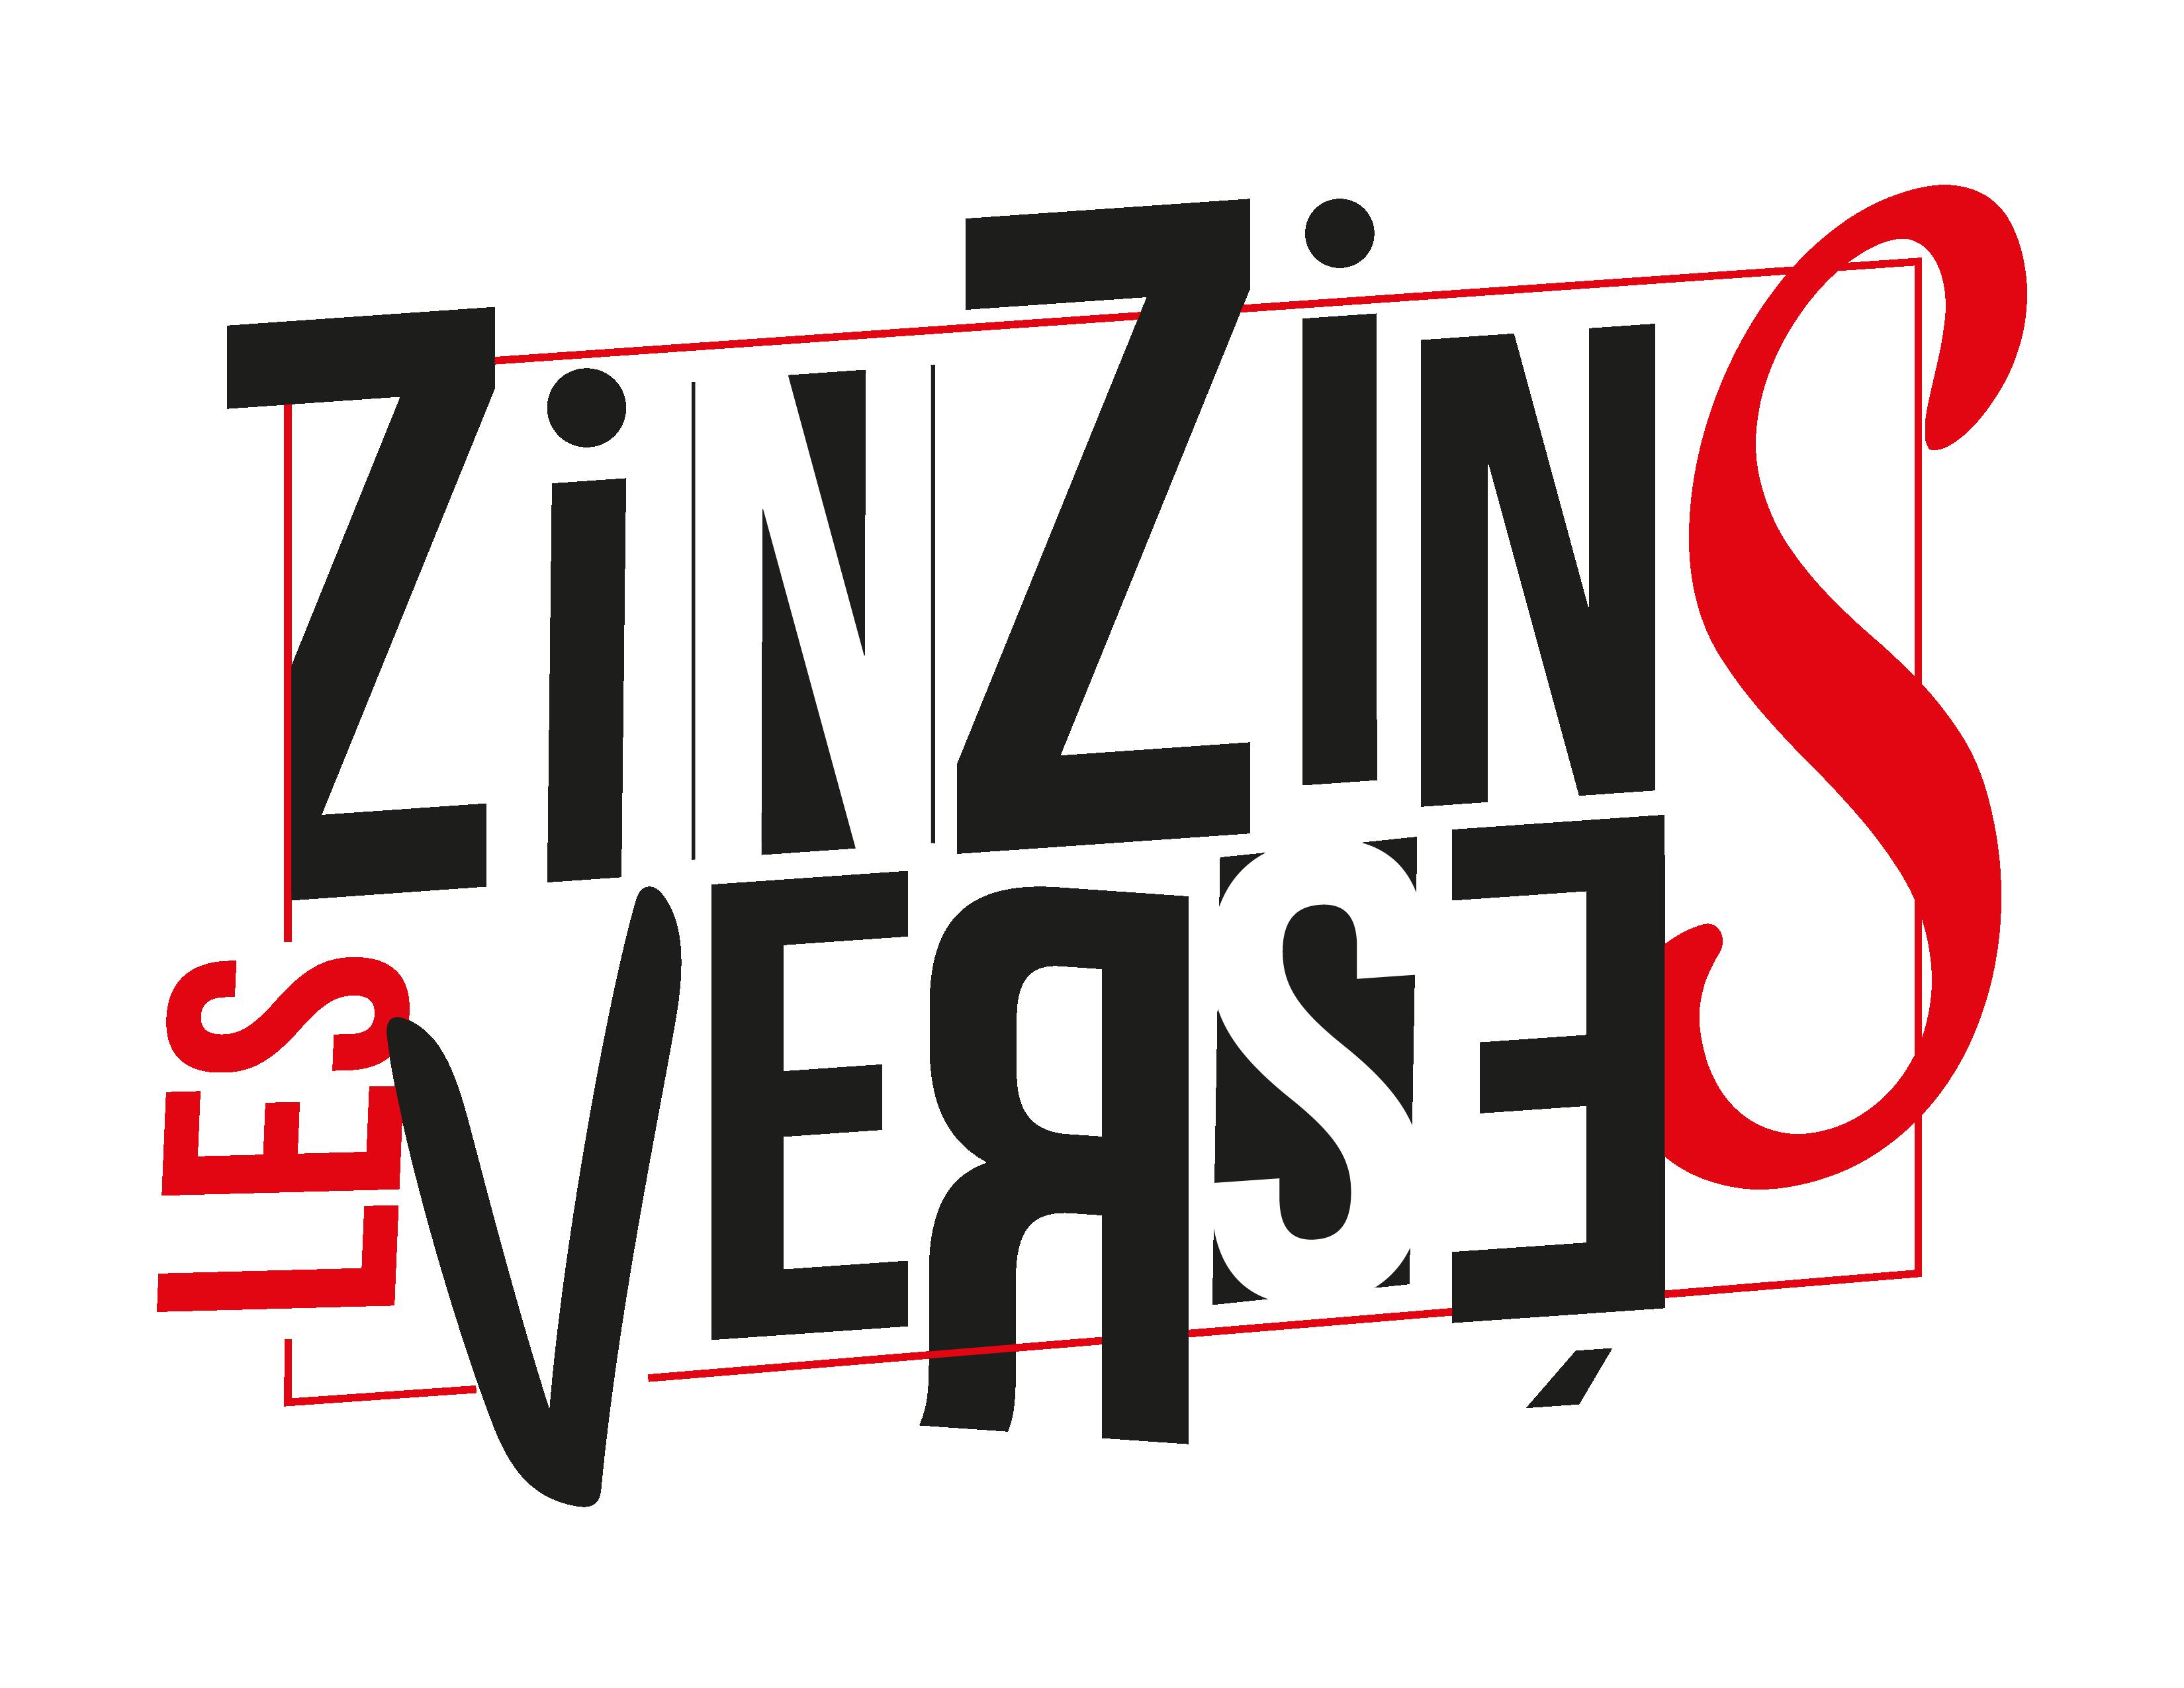 Les Zinzins Versés